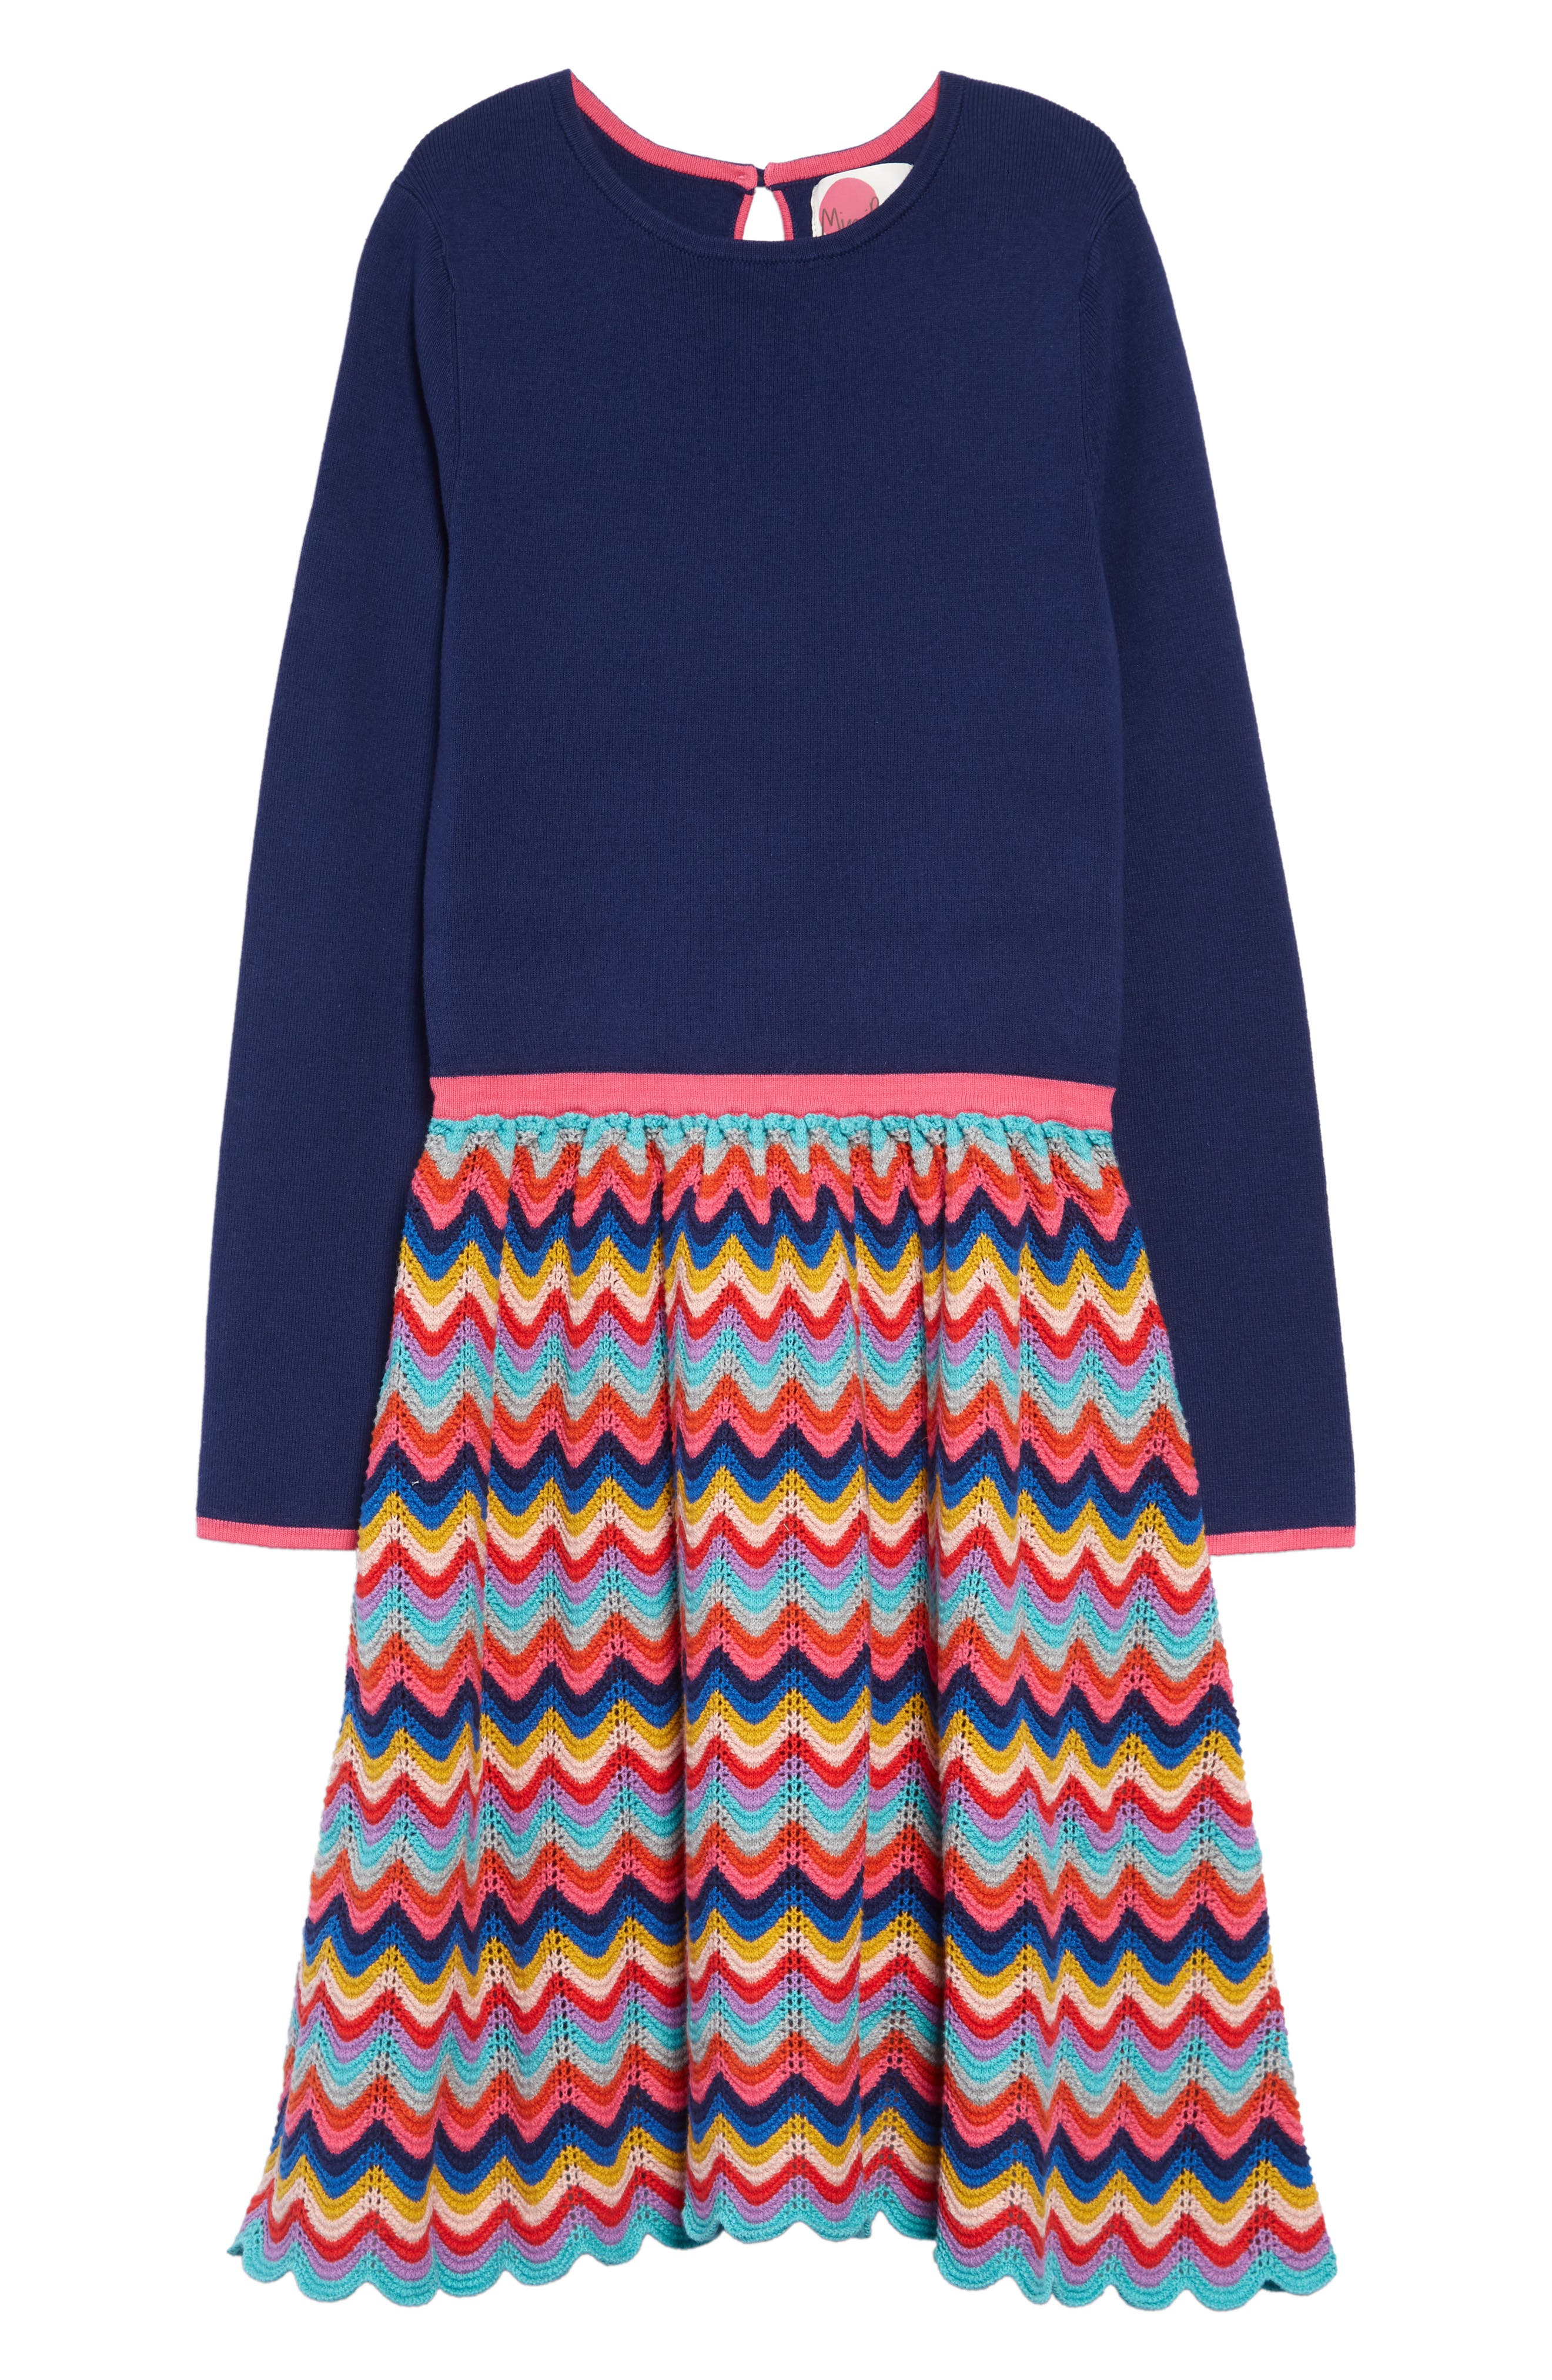 60s 70s Kids Costumes & Clothing Girls & Boys Toddler Girls Mini Boden Rainbow Knit Long Sleeve Dress Size 3-4Y - Blue $60.00 AT vintagedancer.com